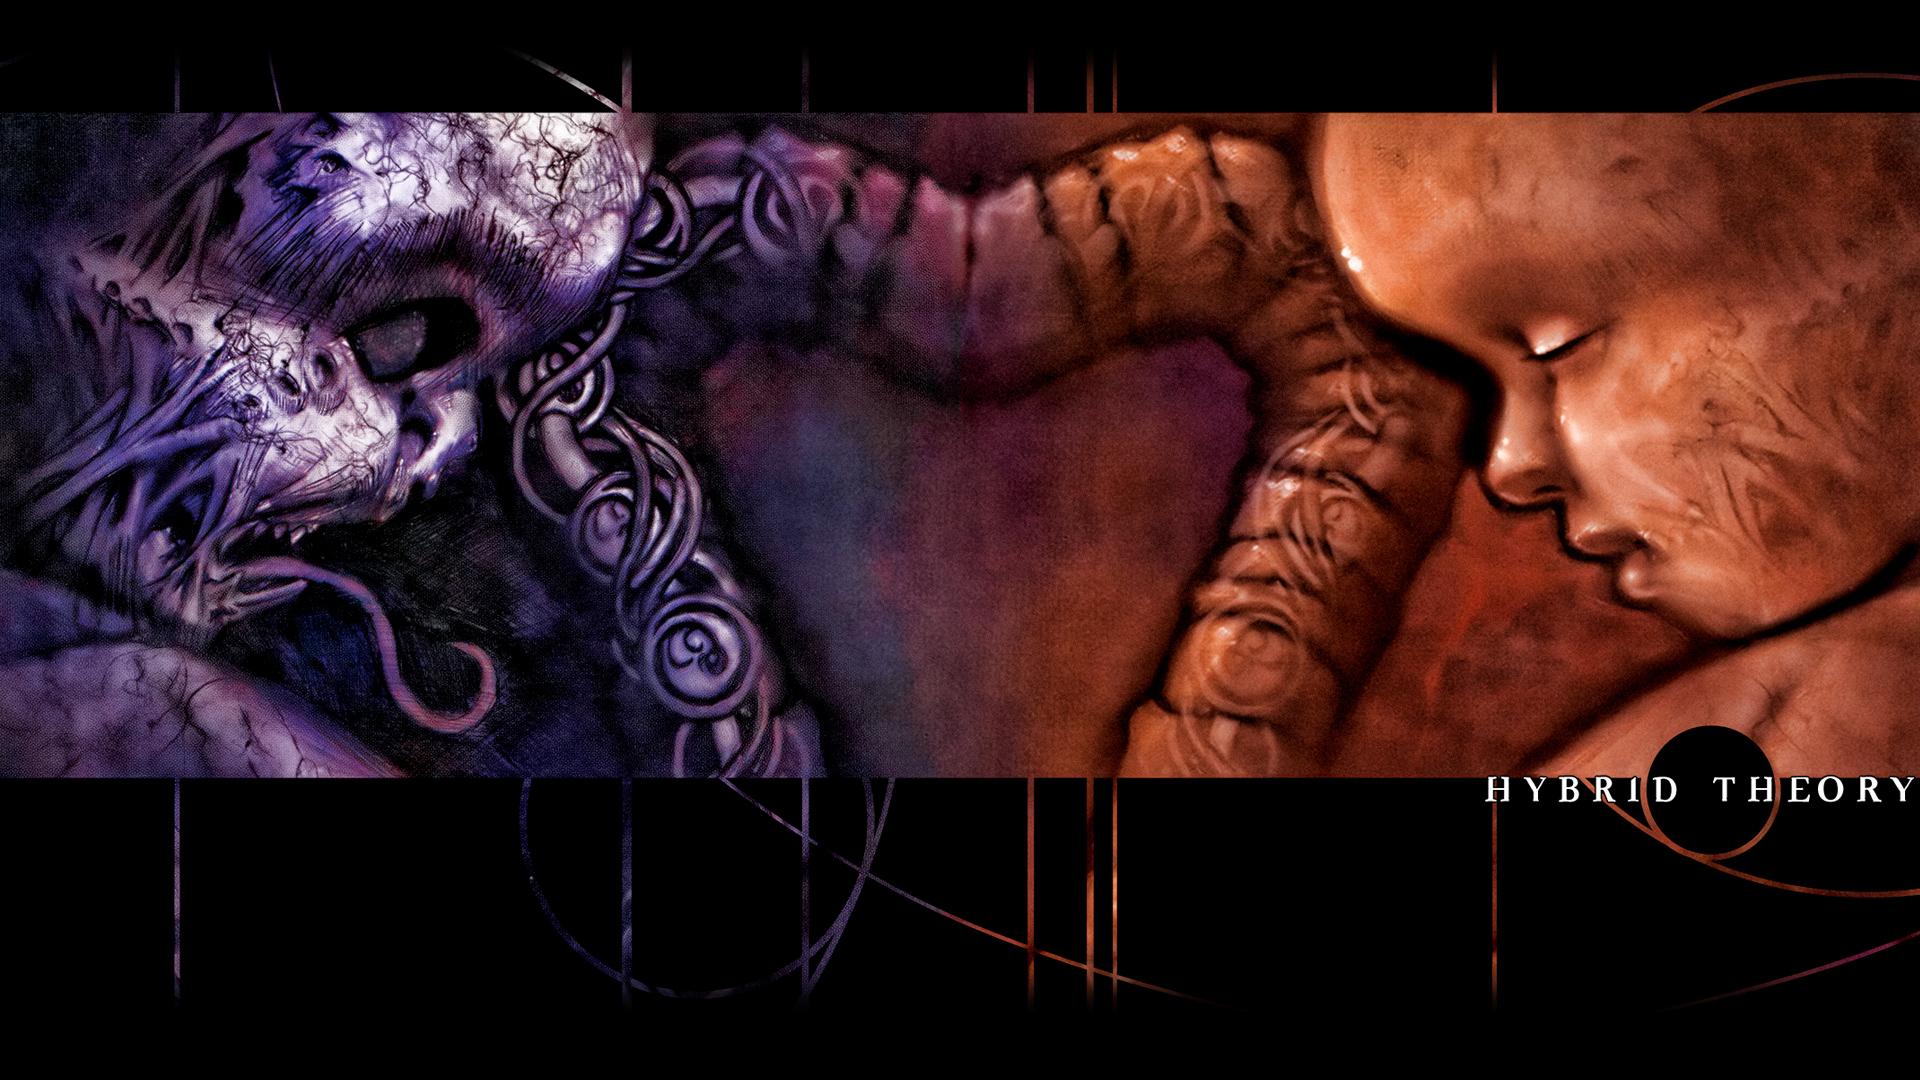 Hybrid Theory Ep Wallpaper By Goodnightfirefly On Deviantart